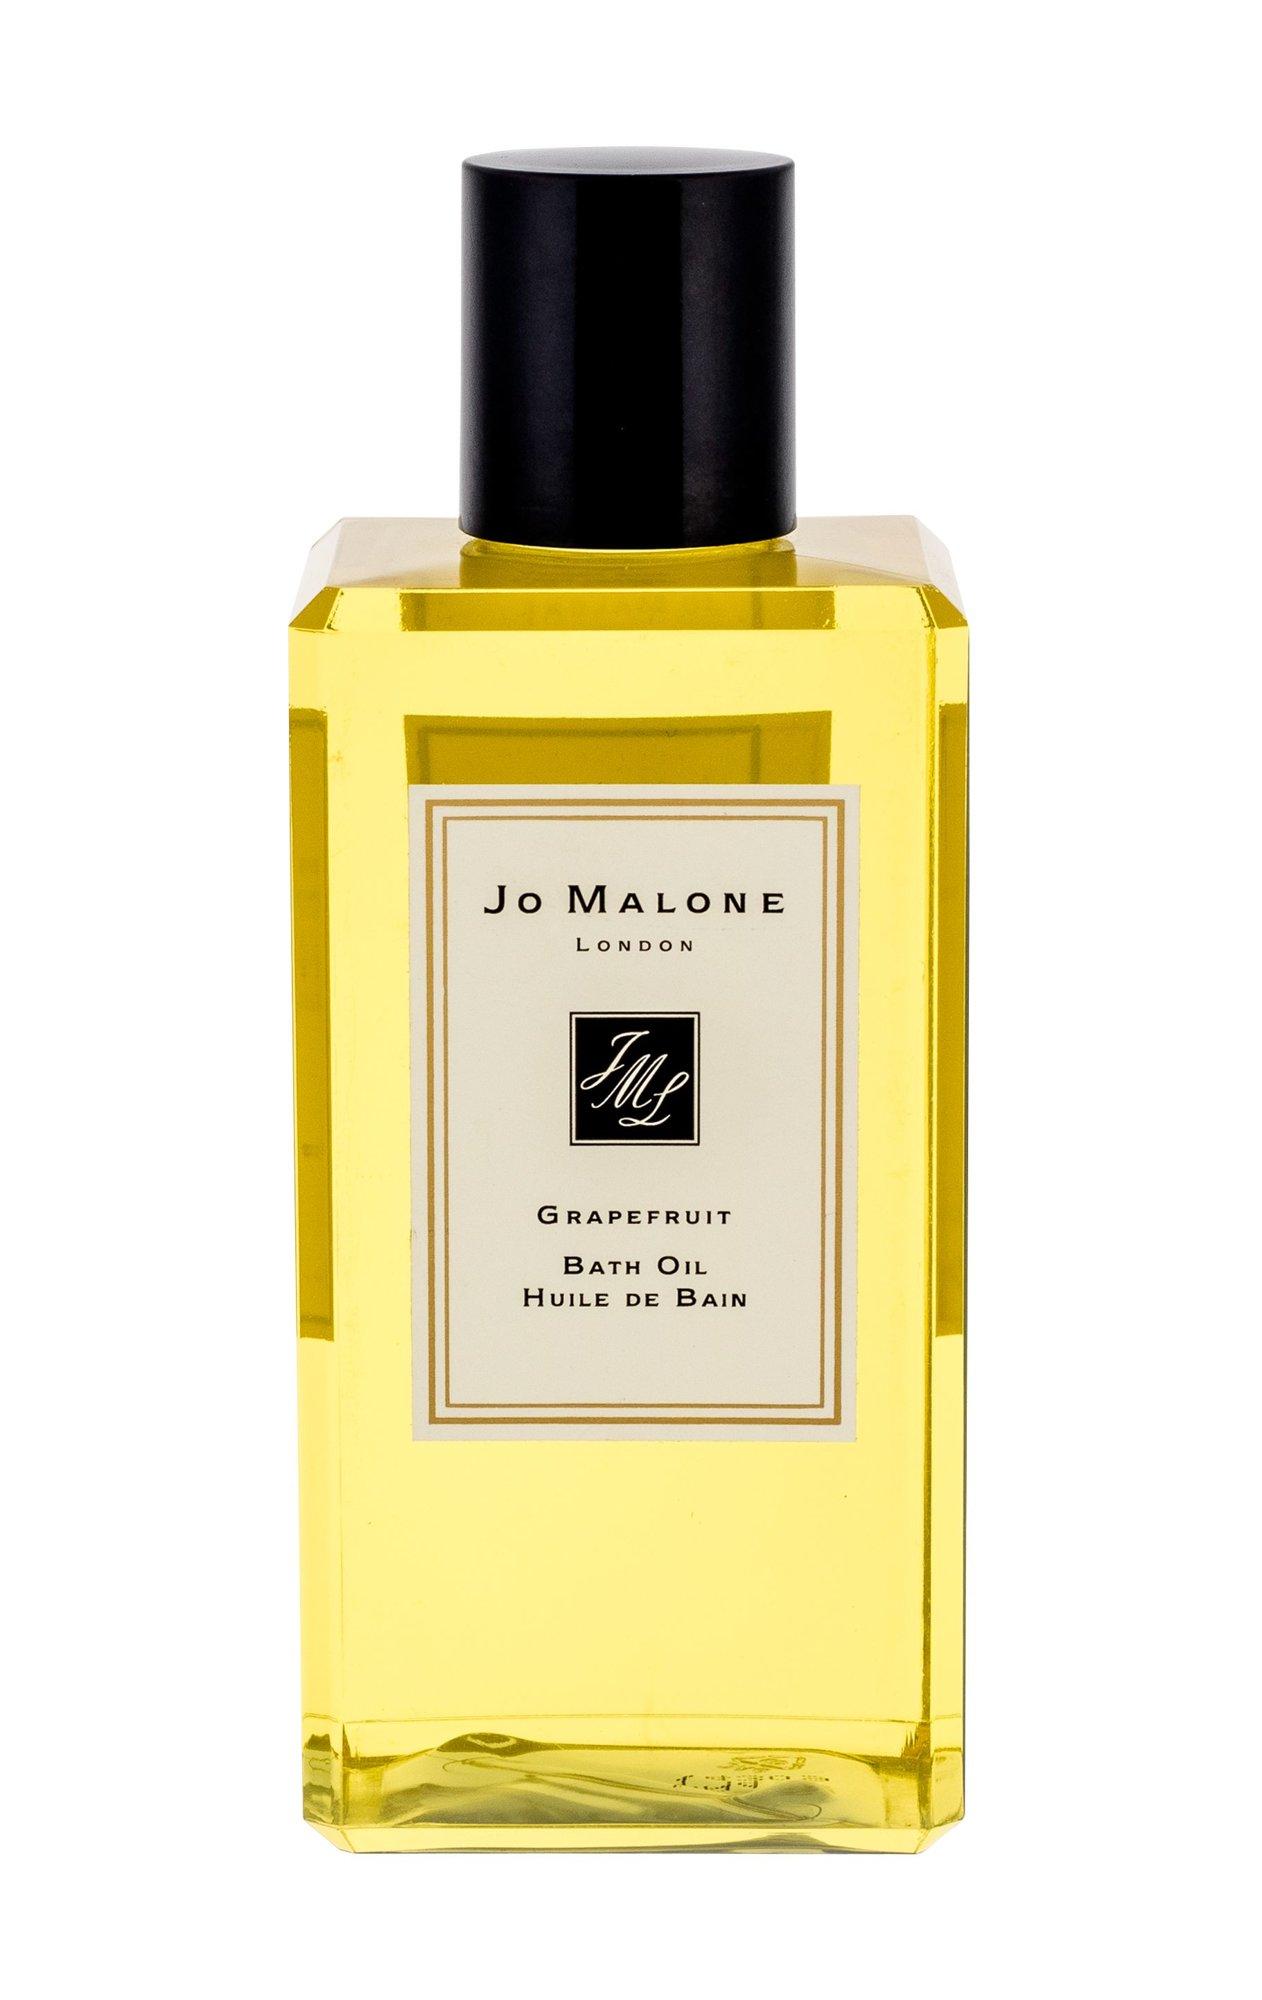 Jo Malone Grapefruit Shower Oil 250ml